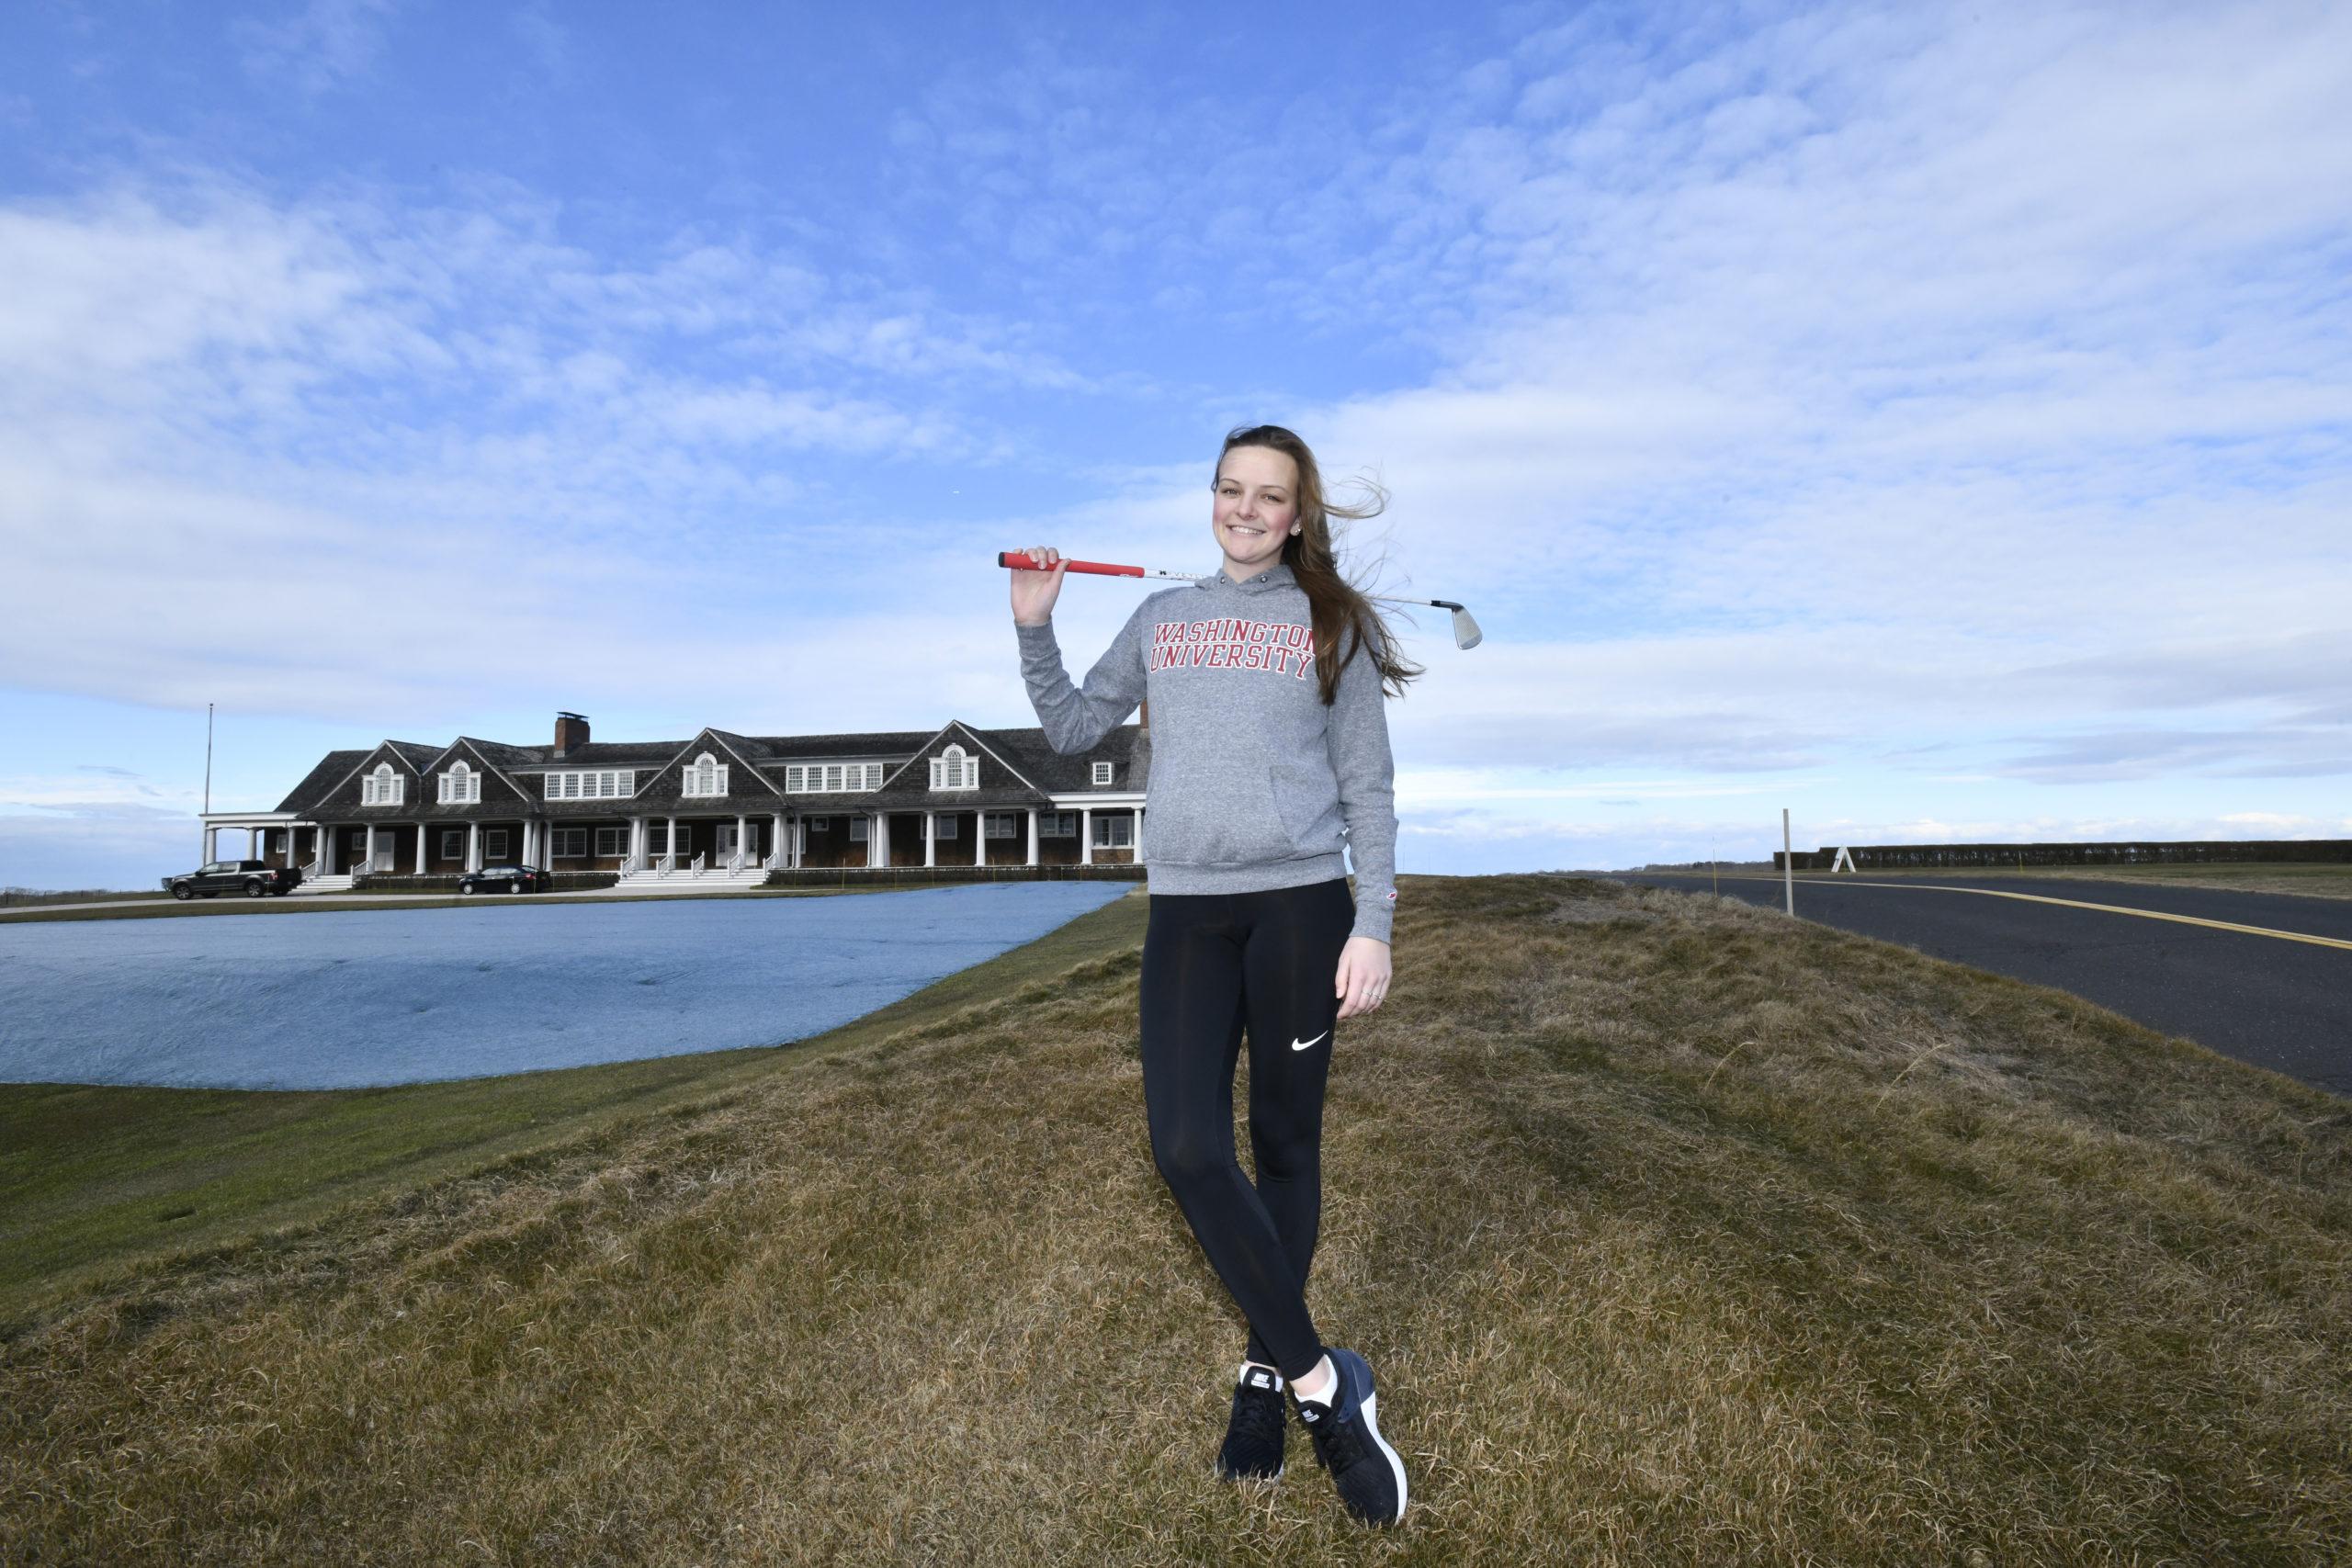 Caraline Oakley at Shinnecock Hills Golf Club on Monday.   DANA SHAW